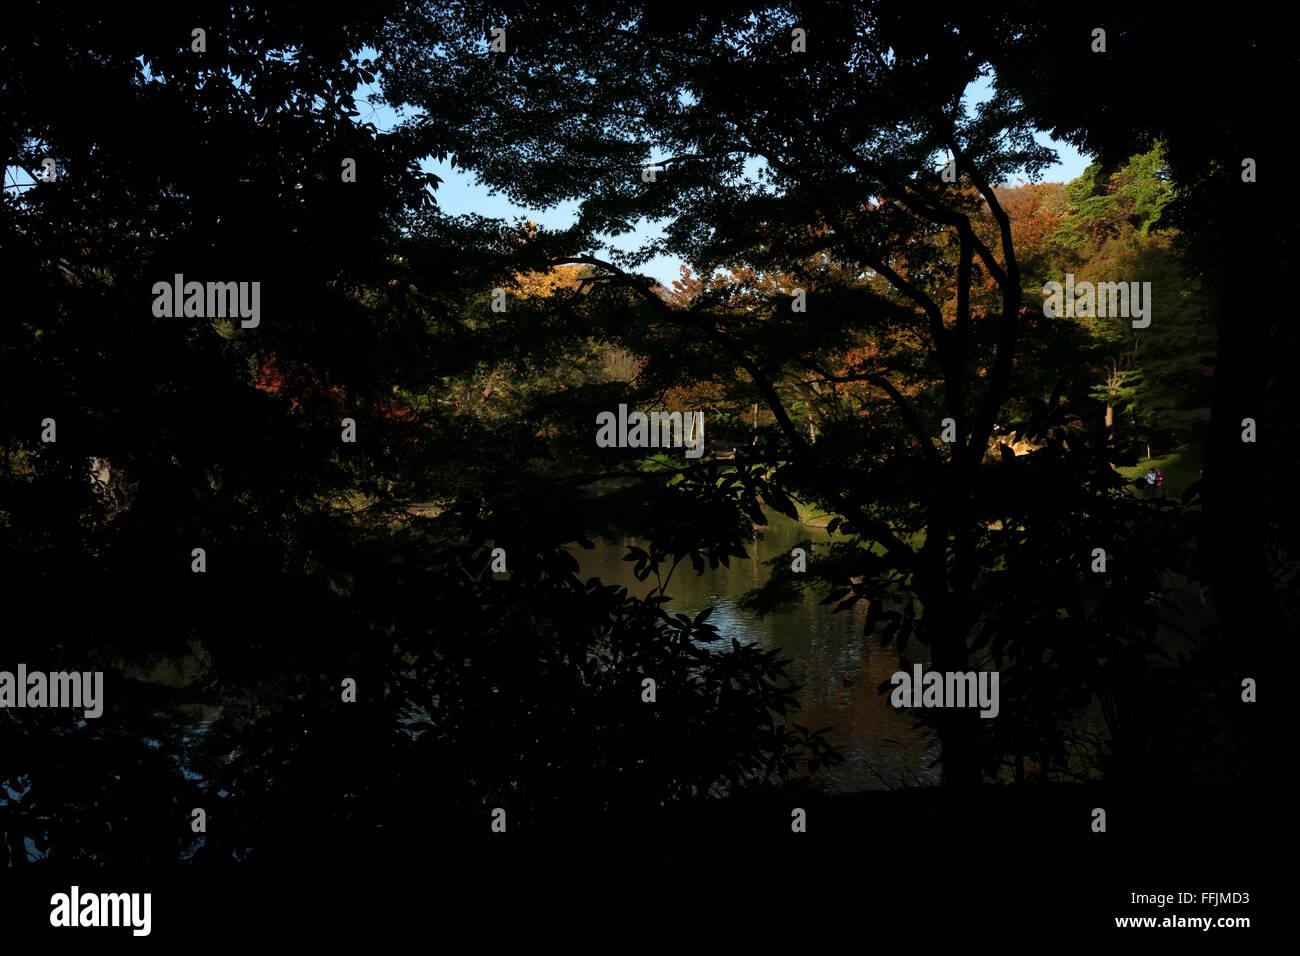 Koishikawa el Jardín Korakuen, Tokio, Japón. Parque de la ciudad en la temporada de otoño, otoño Imagen De Stock